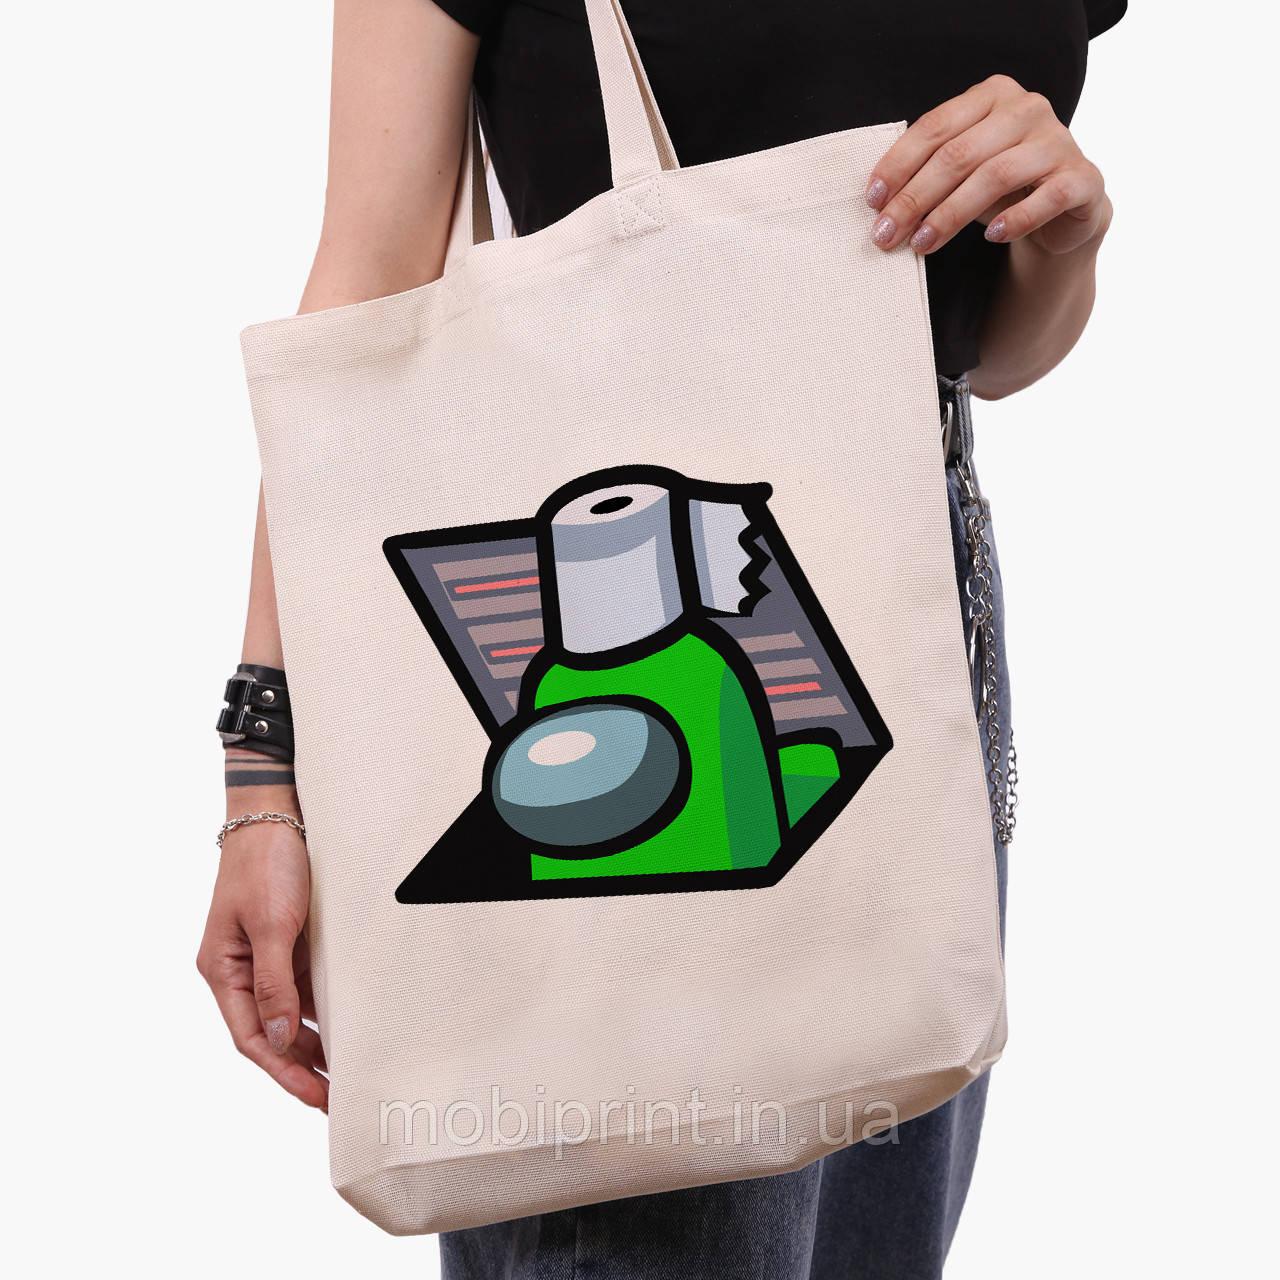 Еко сумка шоппер біла Амонг Ас Зелений (Among Us Green) (9227-2592-1) 41*39*8 см